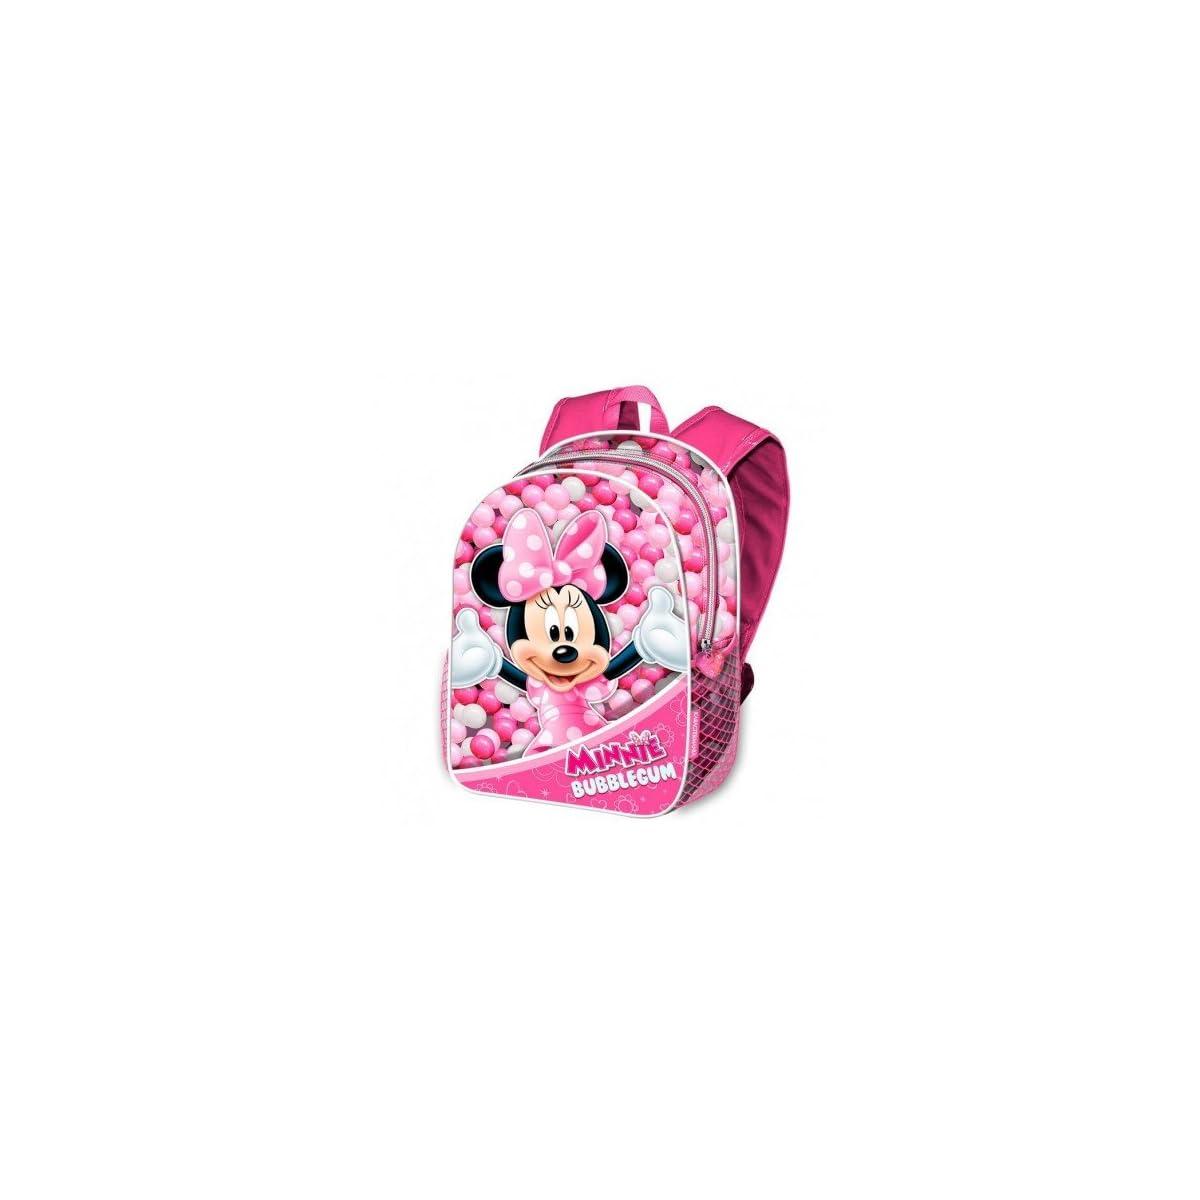 51um4KLbJuL. SS1200  - Karactermania Minnie Mouse Bubblegum Mochilas Infantiles, 40 cm, Rosa